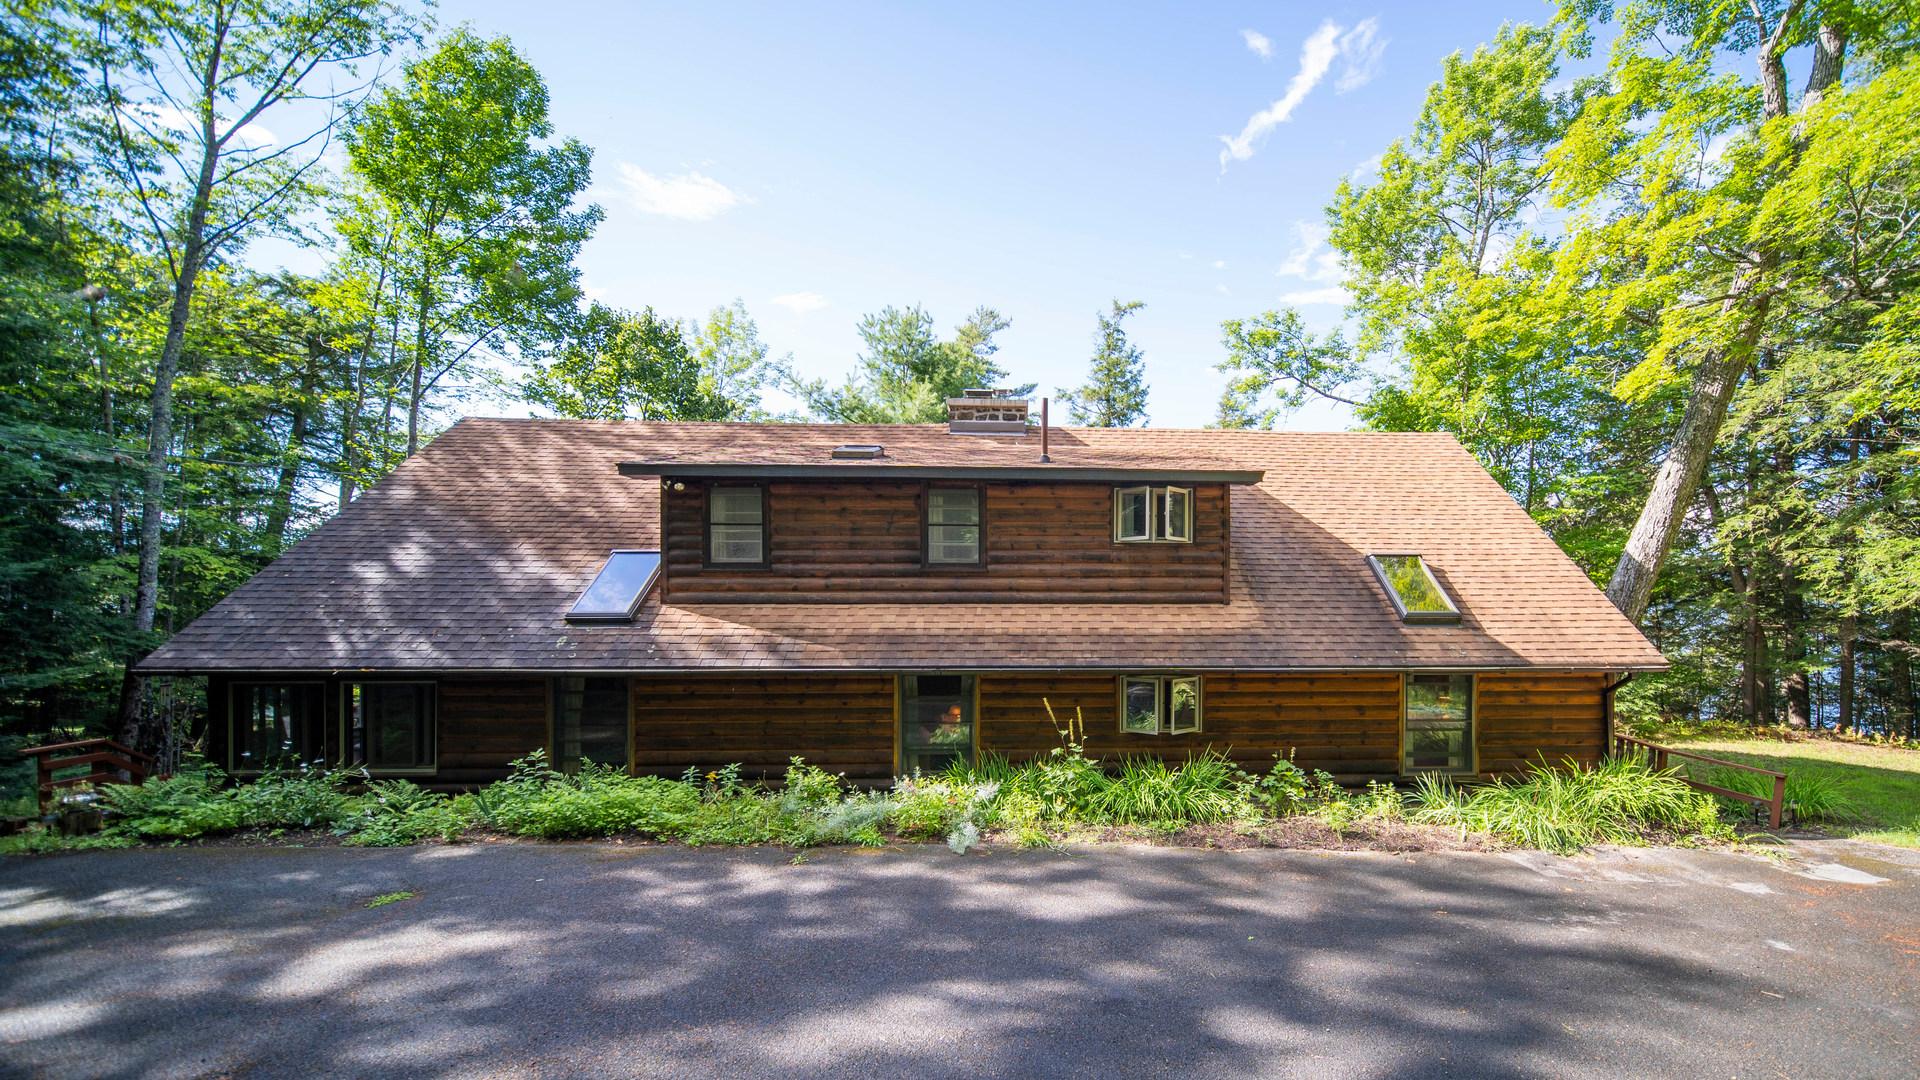 745 Adirondack Rd, Schroon Lake NY